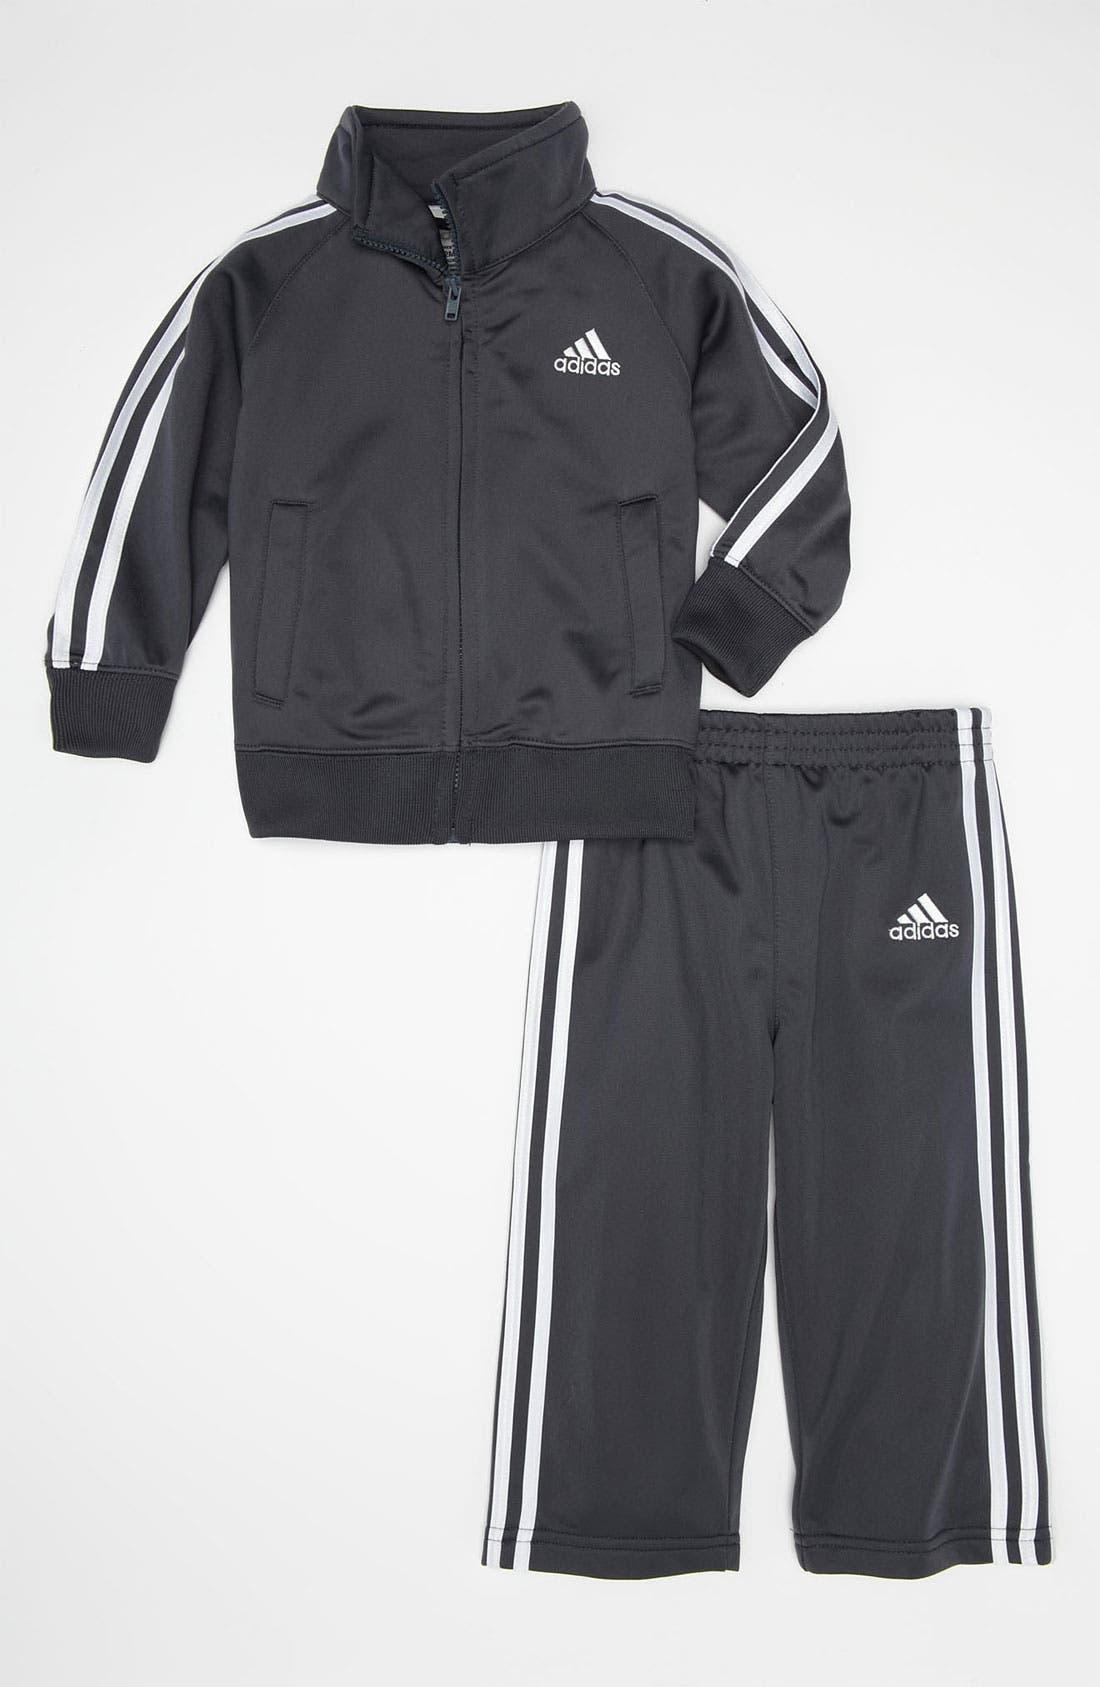 Main Image - adidas Tricot Jacket & Pants (Infant)